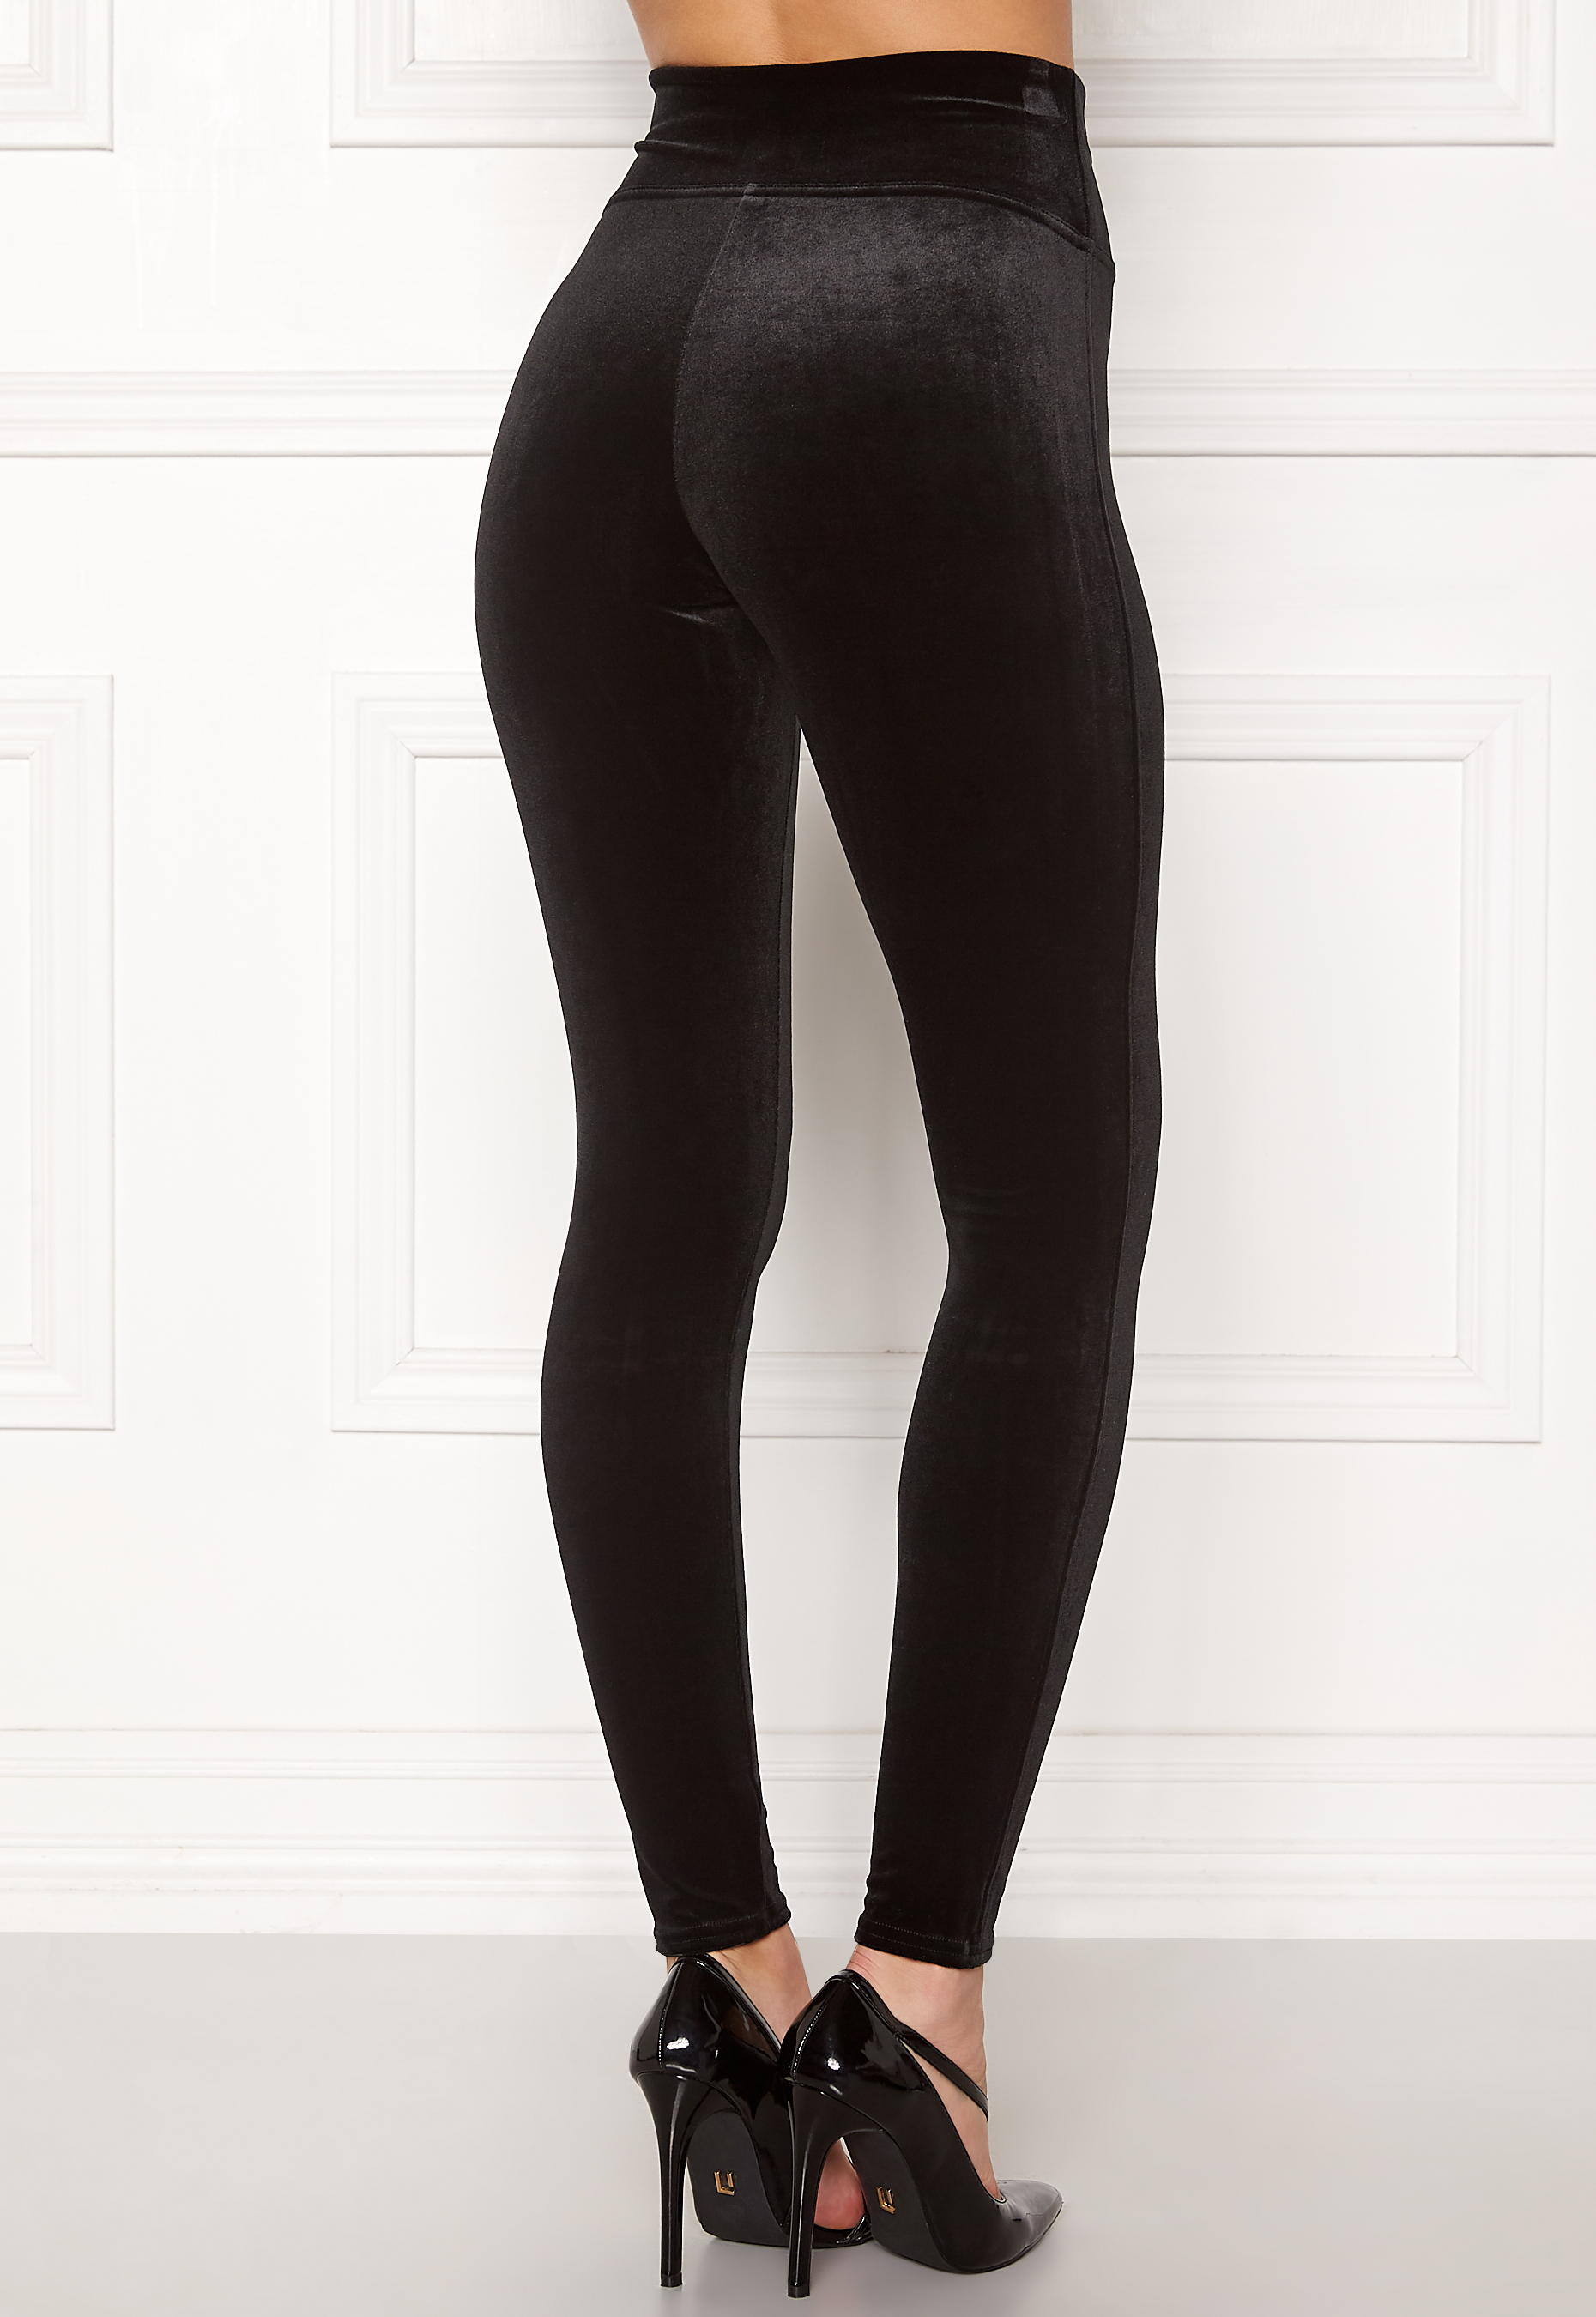 40c5fba60622c Spanx Velvet Leggings Very Black - Bubbleroom